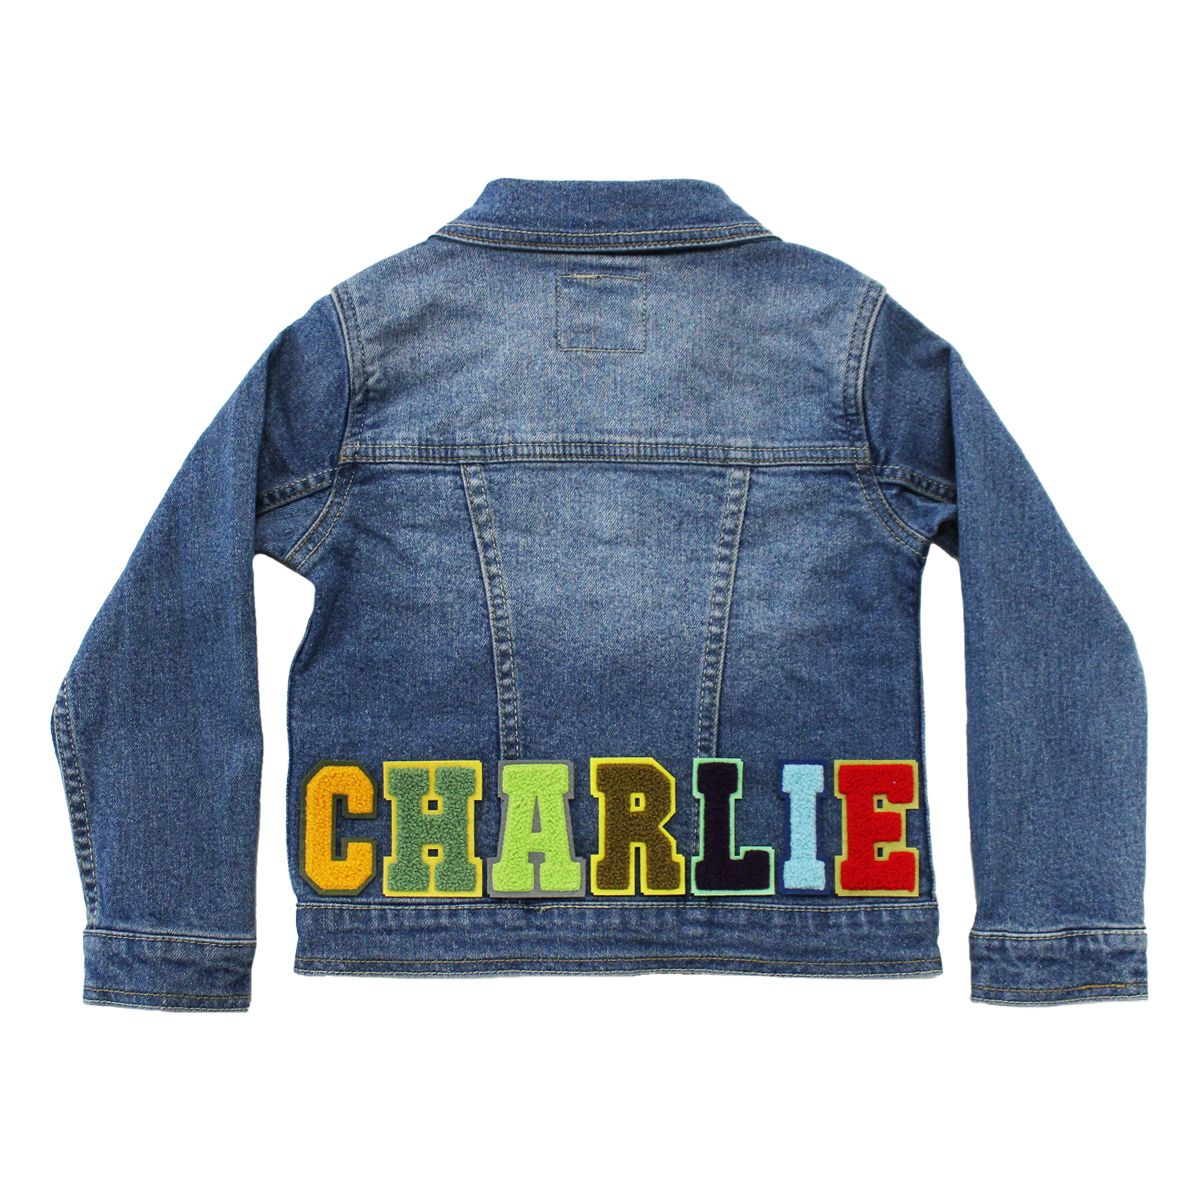 Levi S Baby Toddler Big Kid Personalized Denim Jacket Letters Only In 2021 Denim Jacket Jackets Customised Denim Jacket [ 1200 x 1200 Pixel ]